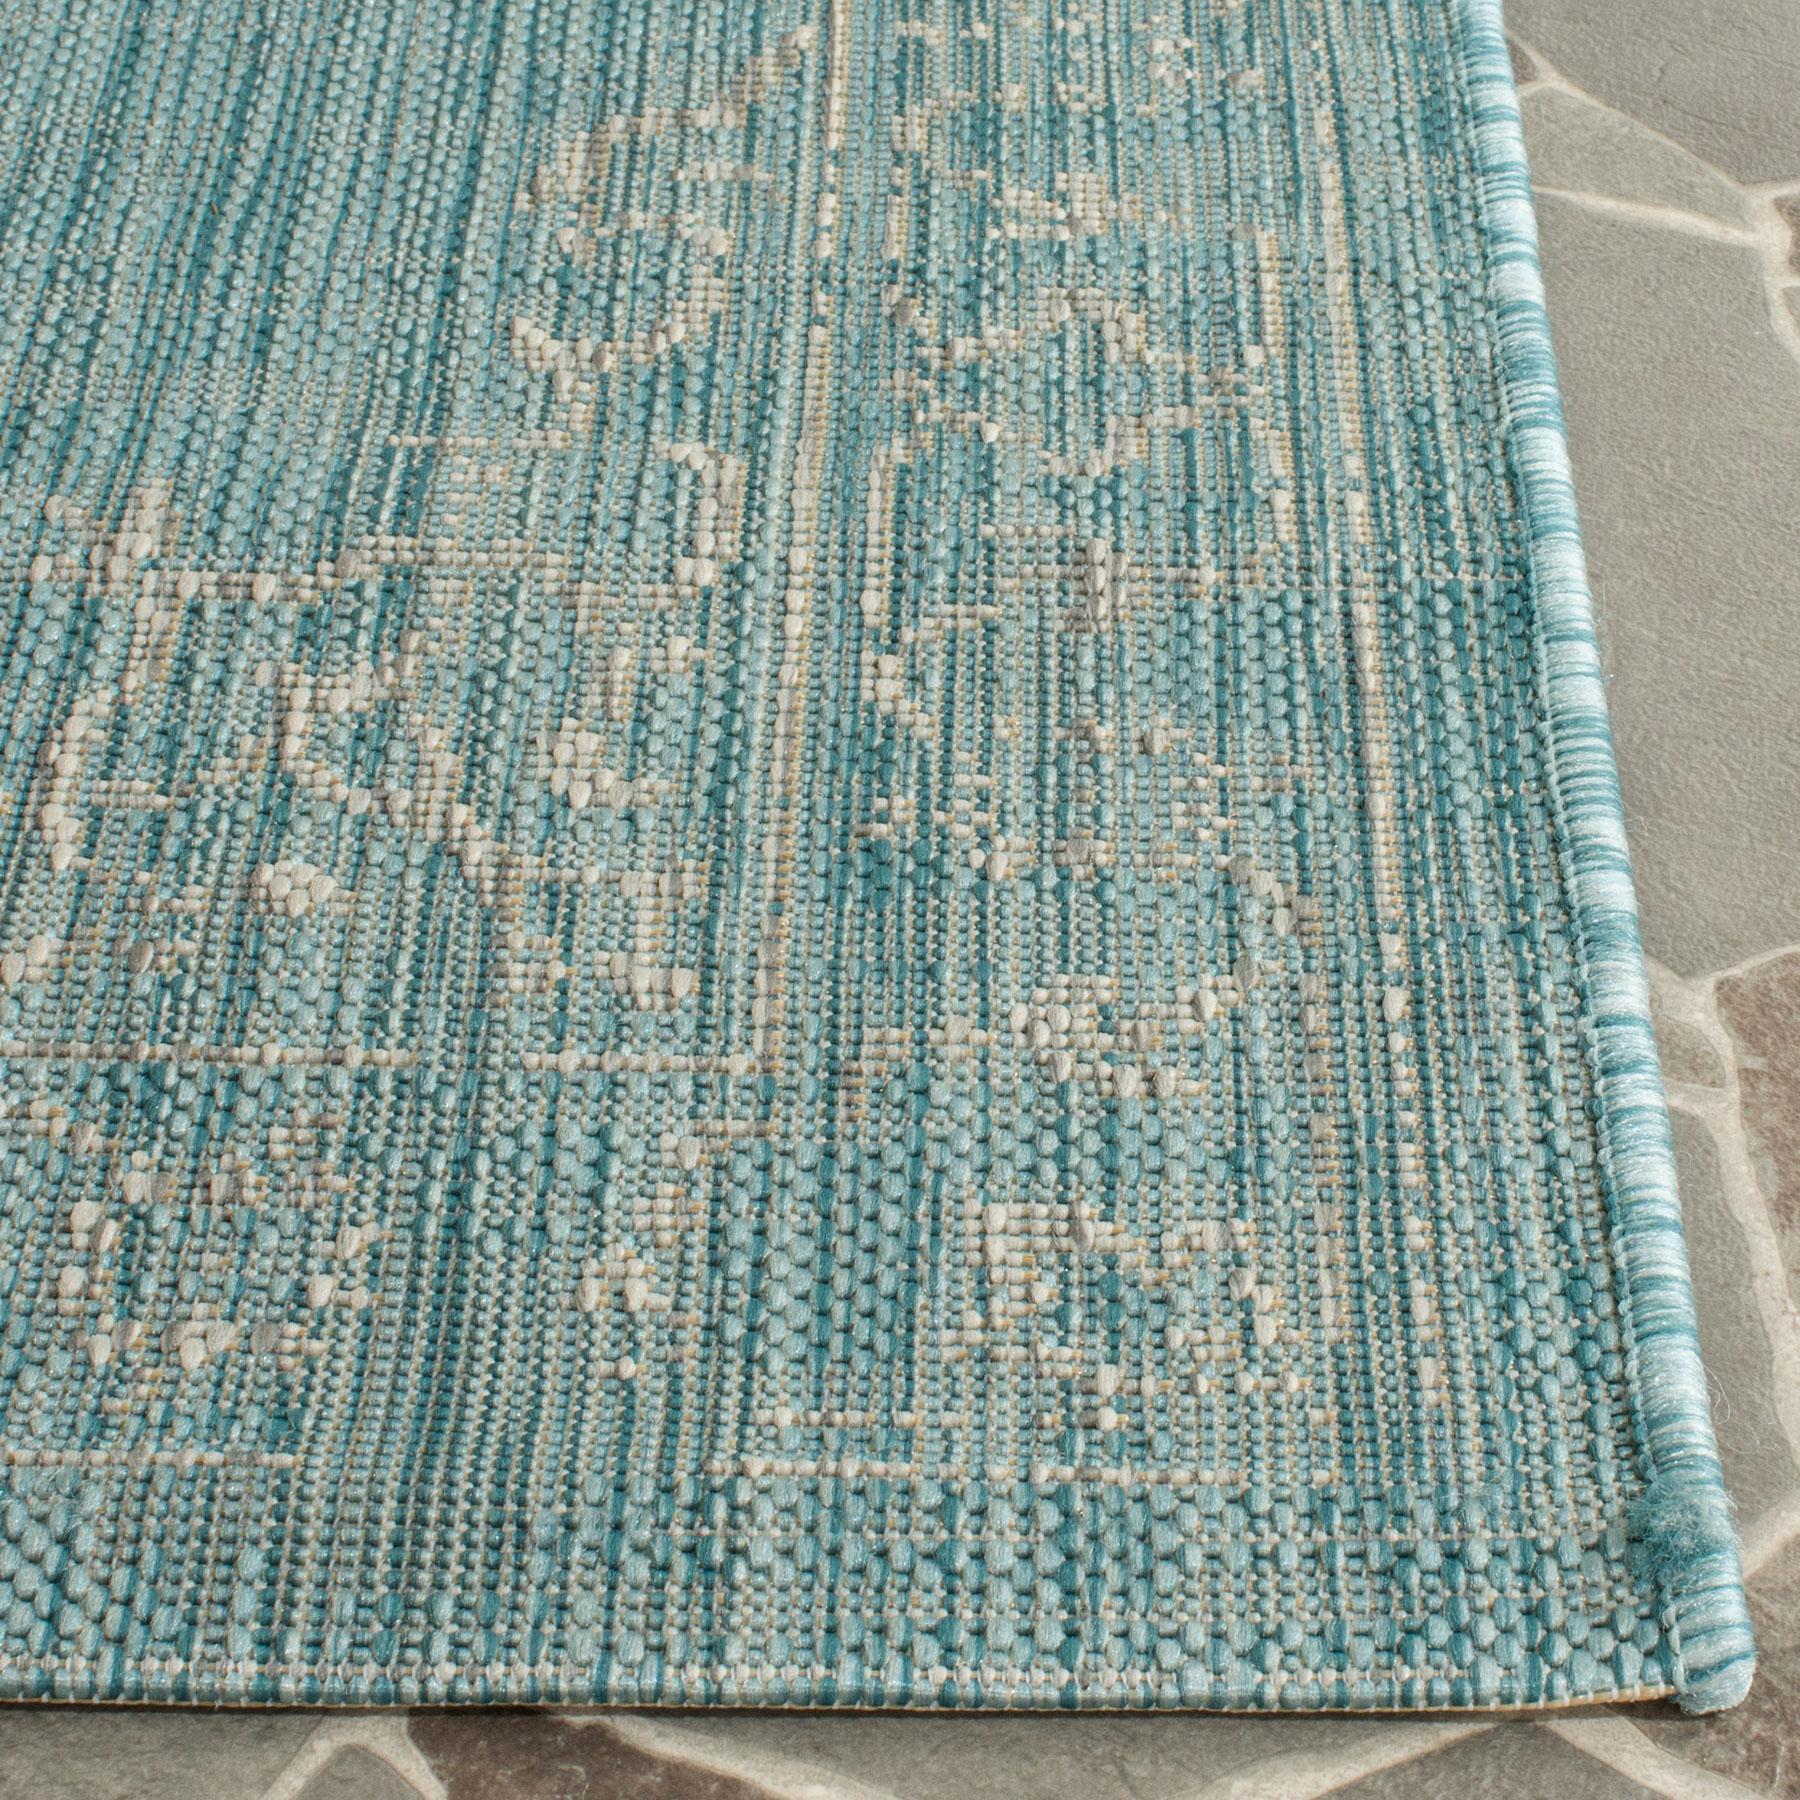 Turquoise Indoor-Outdoor Rug | Easy-Clean Rugs - Safavieh